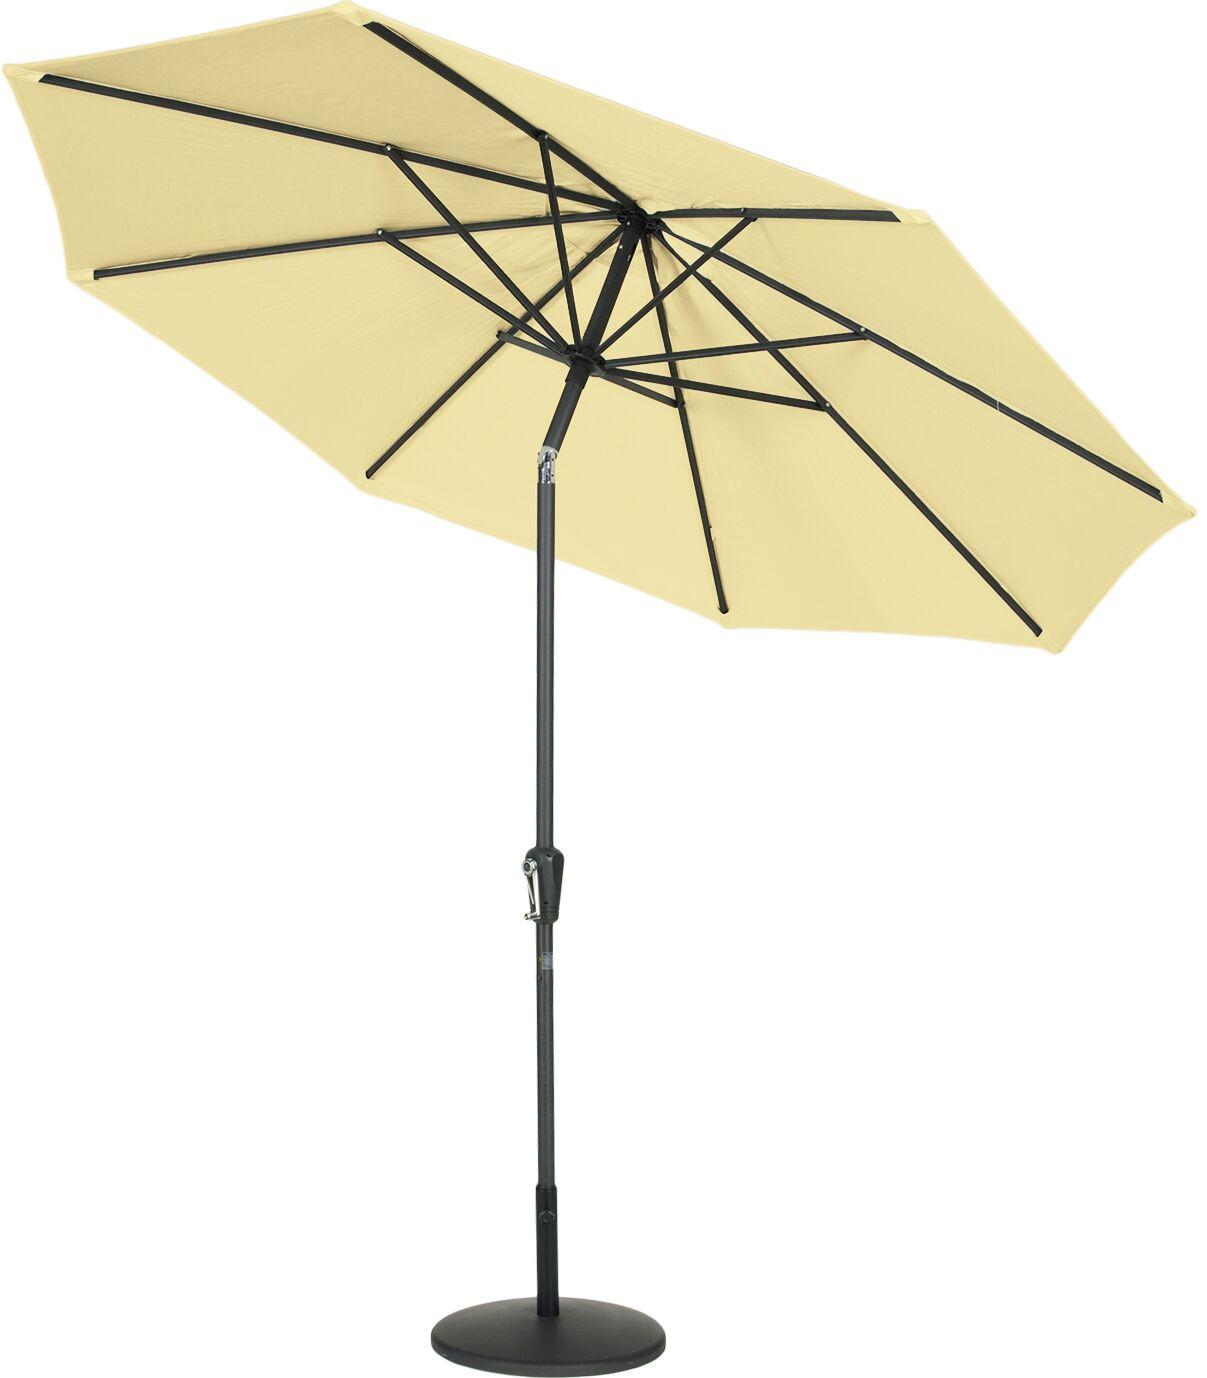 9' Market Umbrella Fabric: Wheat